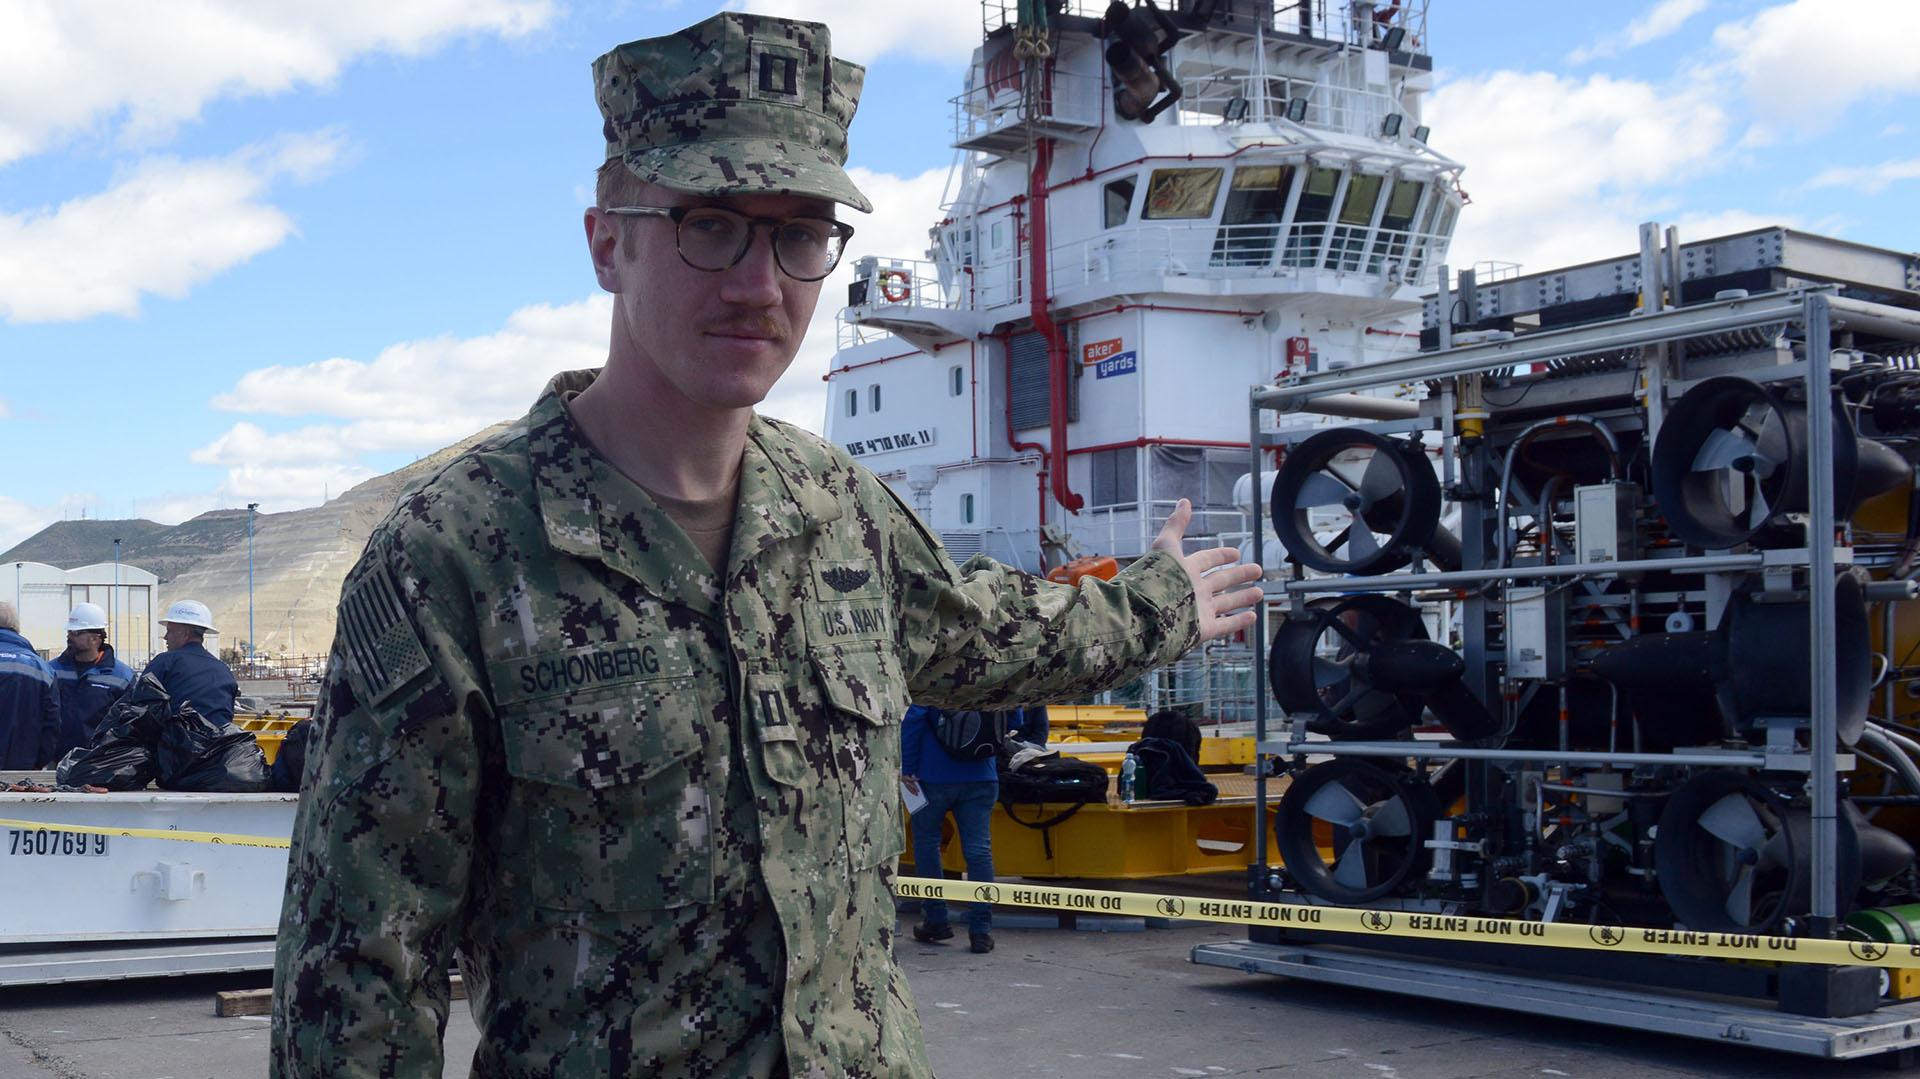 Kurt Schomberg, portavoz de la marina estadounidense (Walter Calderon)